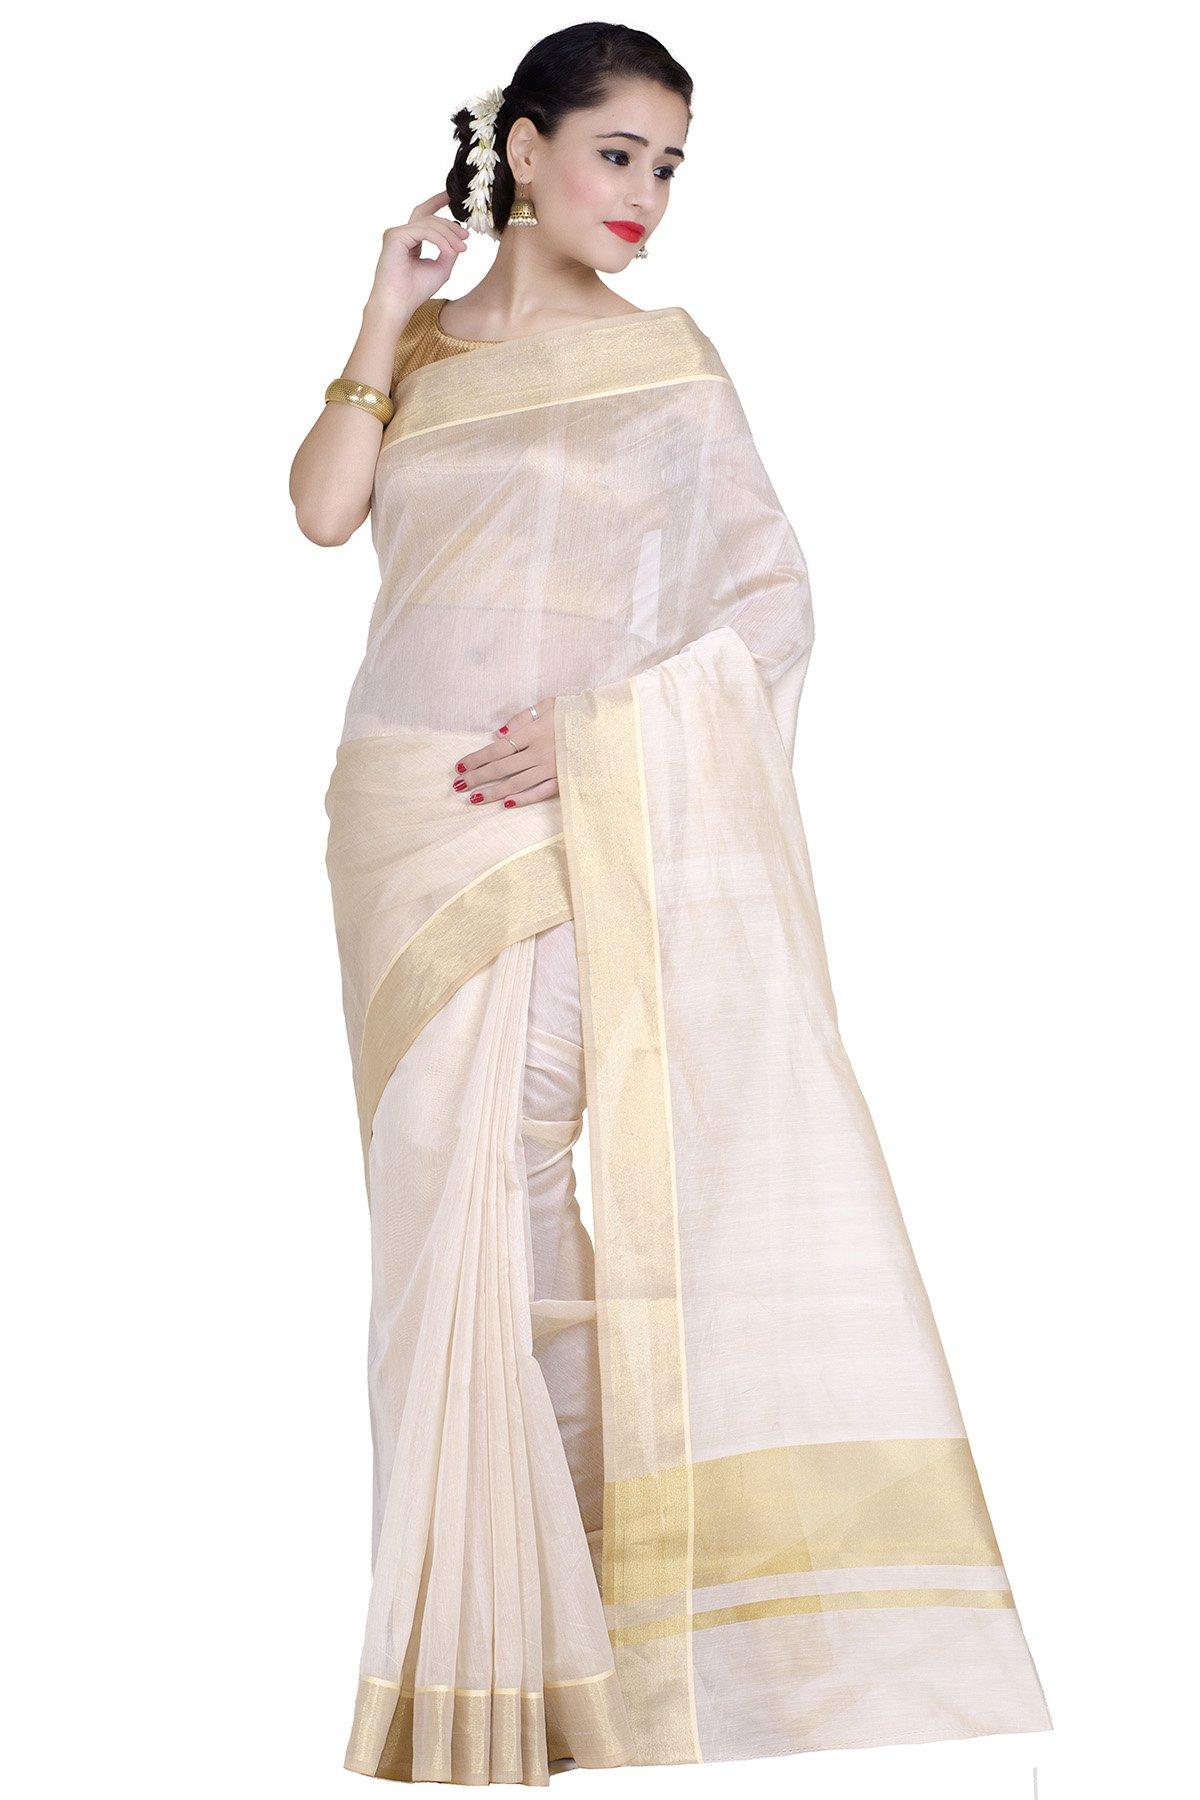 Chandrakala Women's Beige Cotton Silk Banarasi Saree with unstitched Blousepiece.